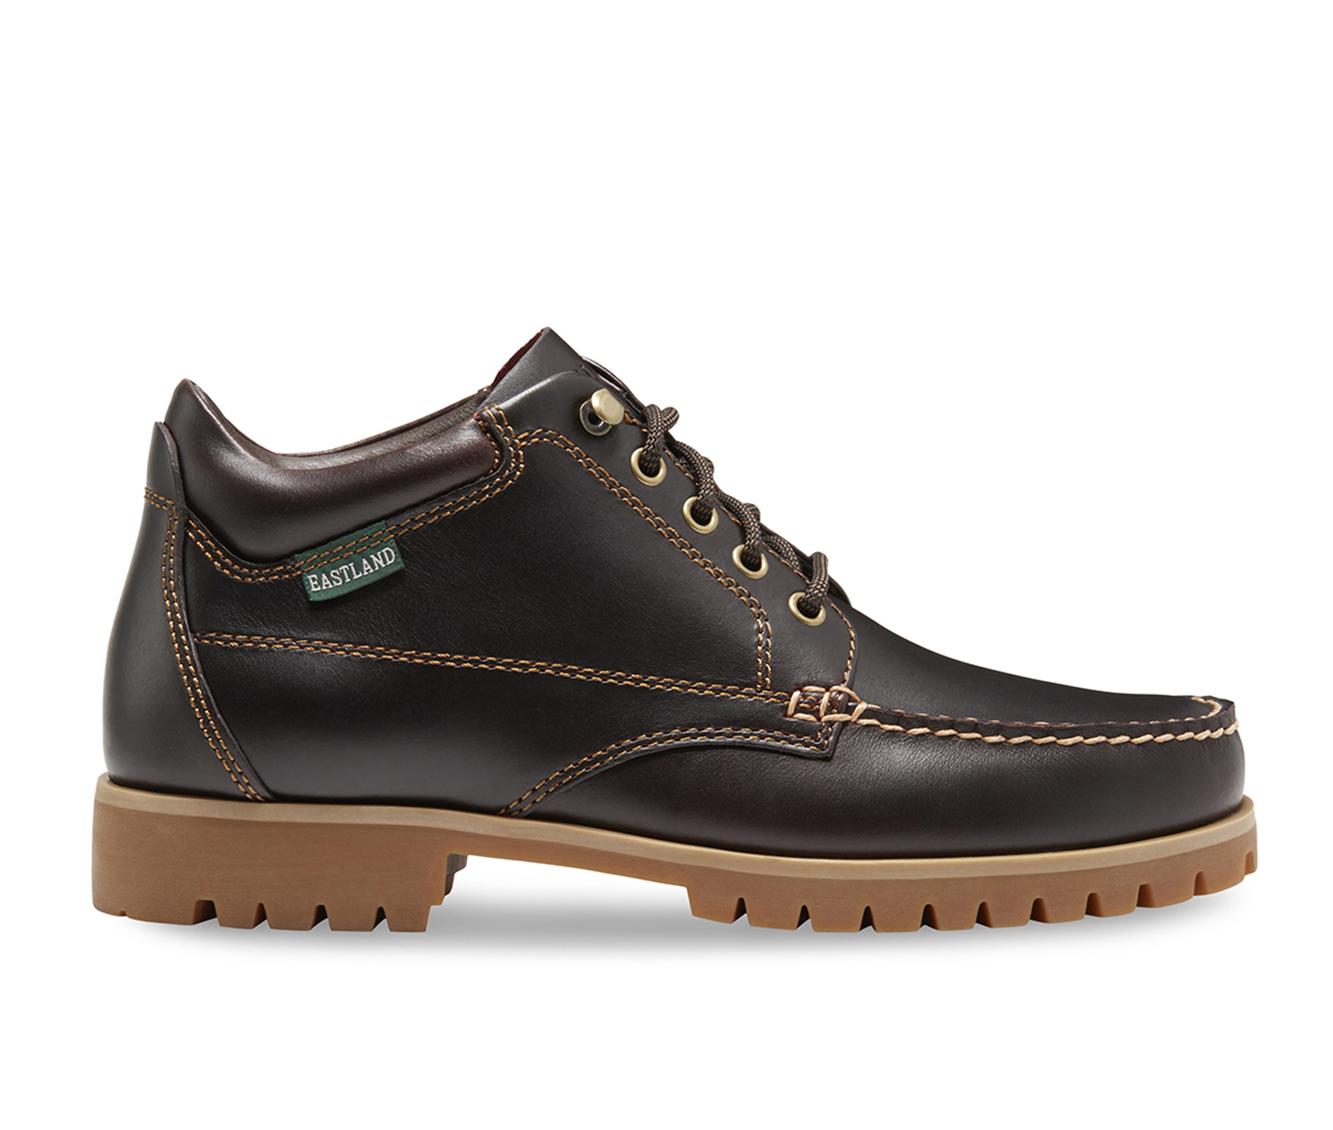 Eastland Brooklyn Moc Toe Men's Boots (Brown Leather)